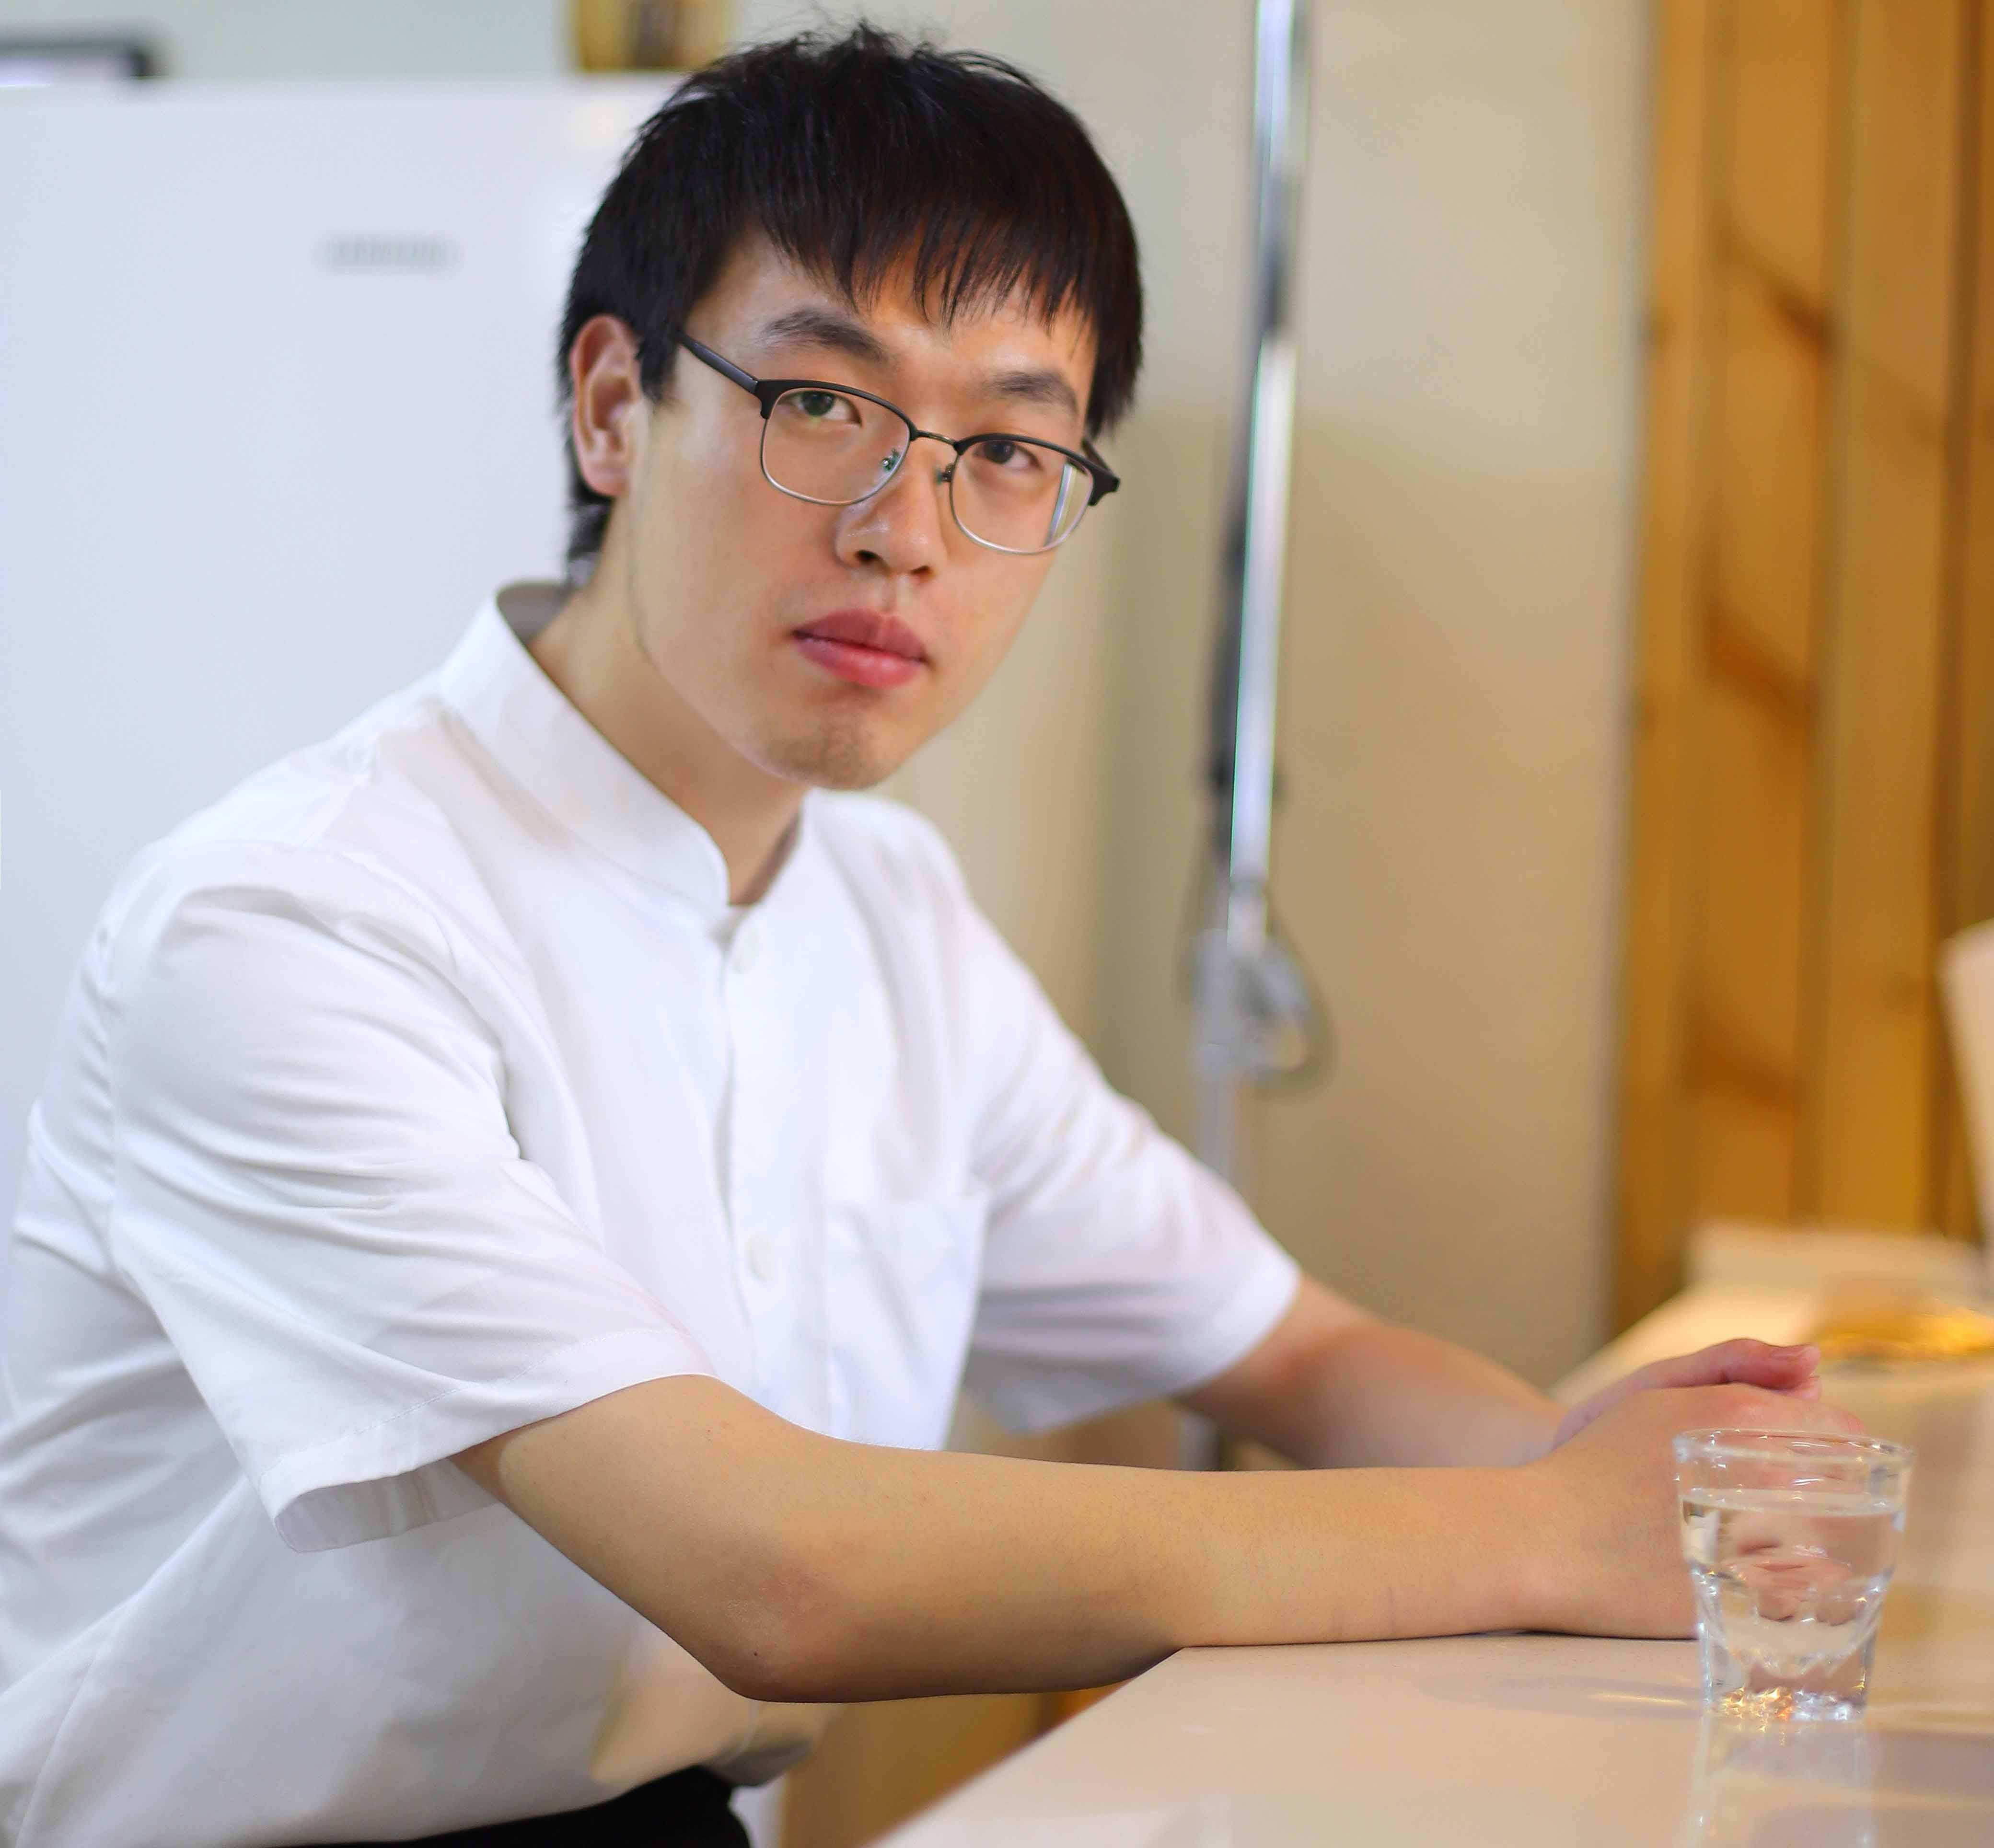 <b>陕西新纪元烹饪学校毕业学子景渊:选择一条路,就要走一辈子</b>